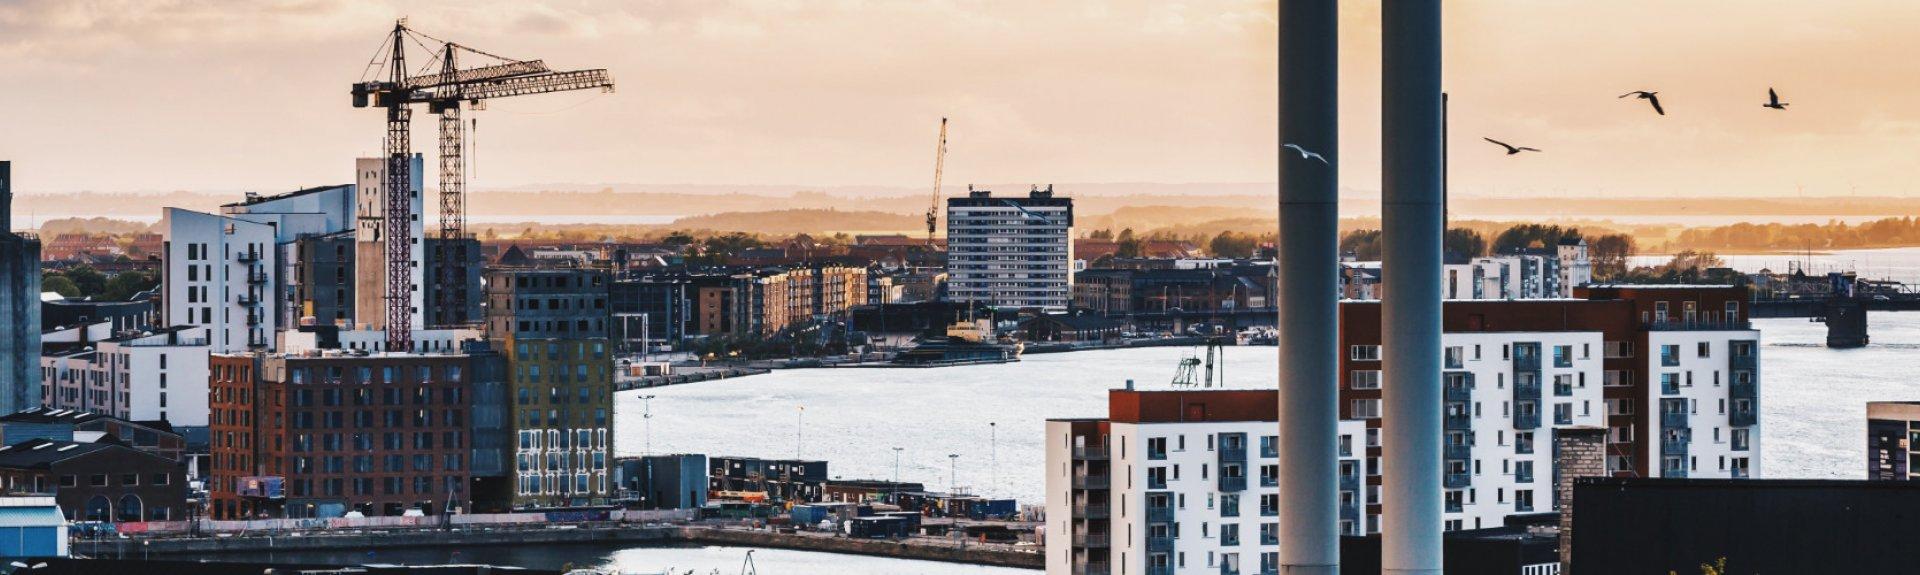 Aalborg-havn